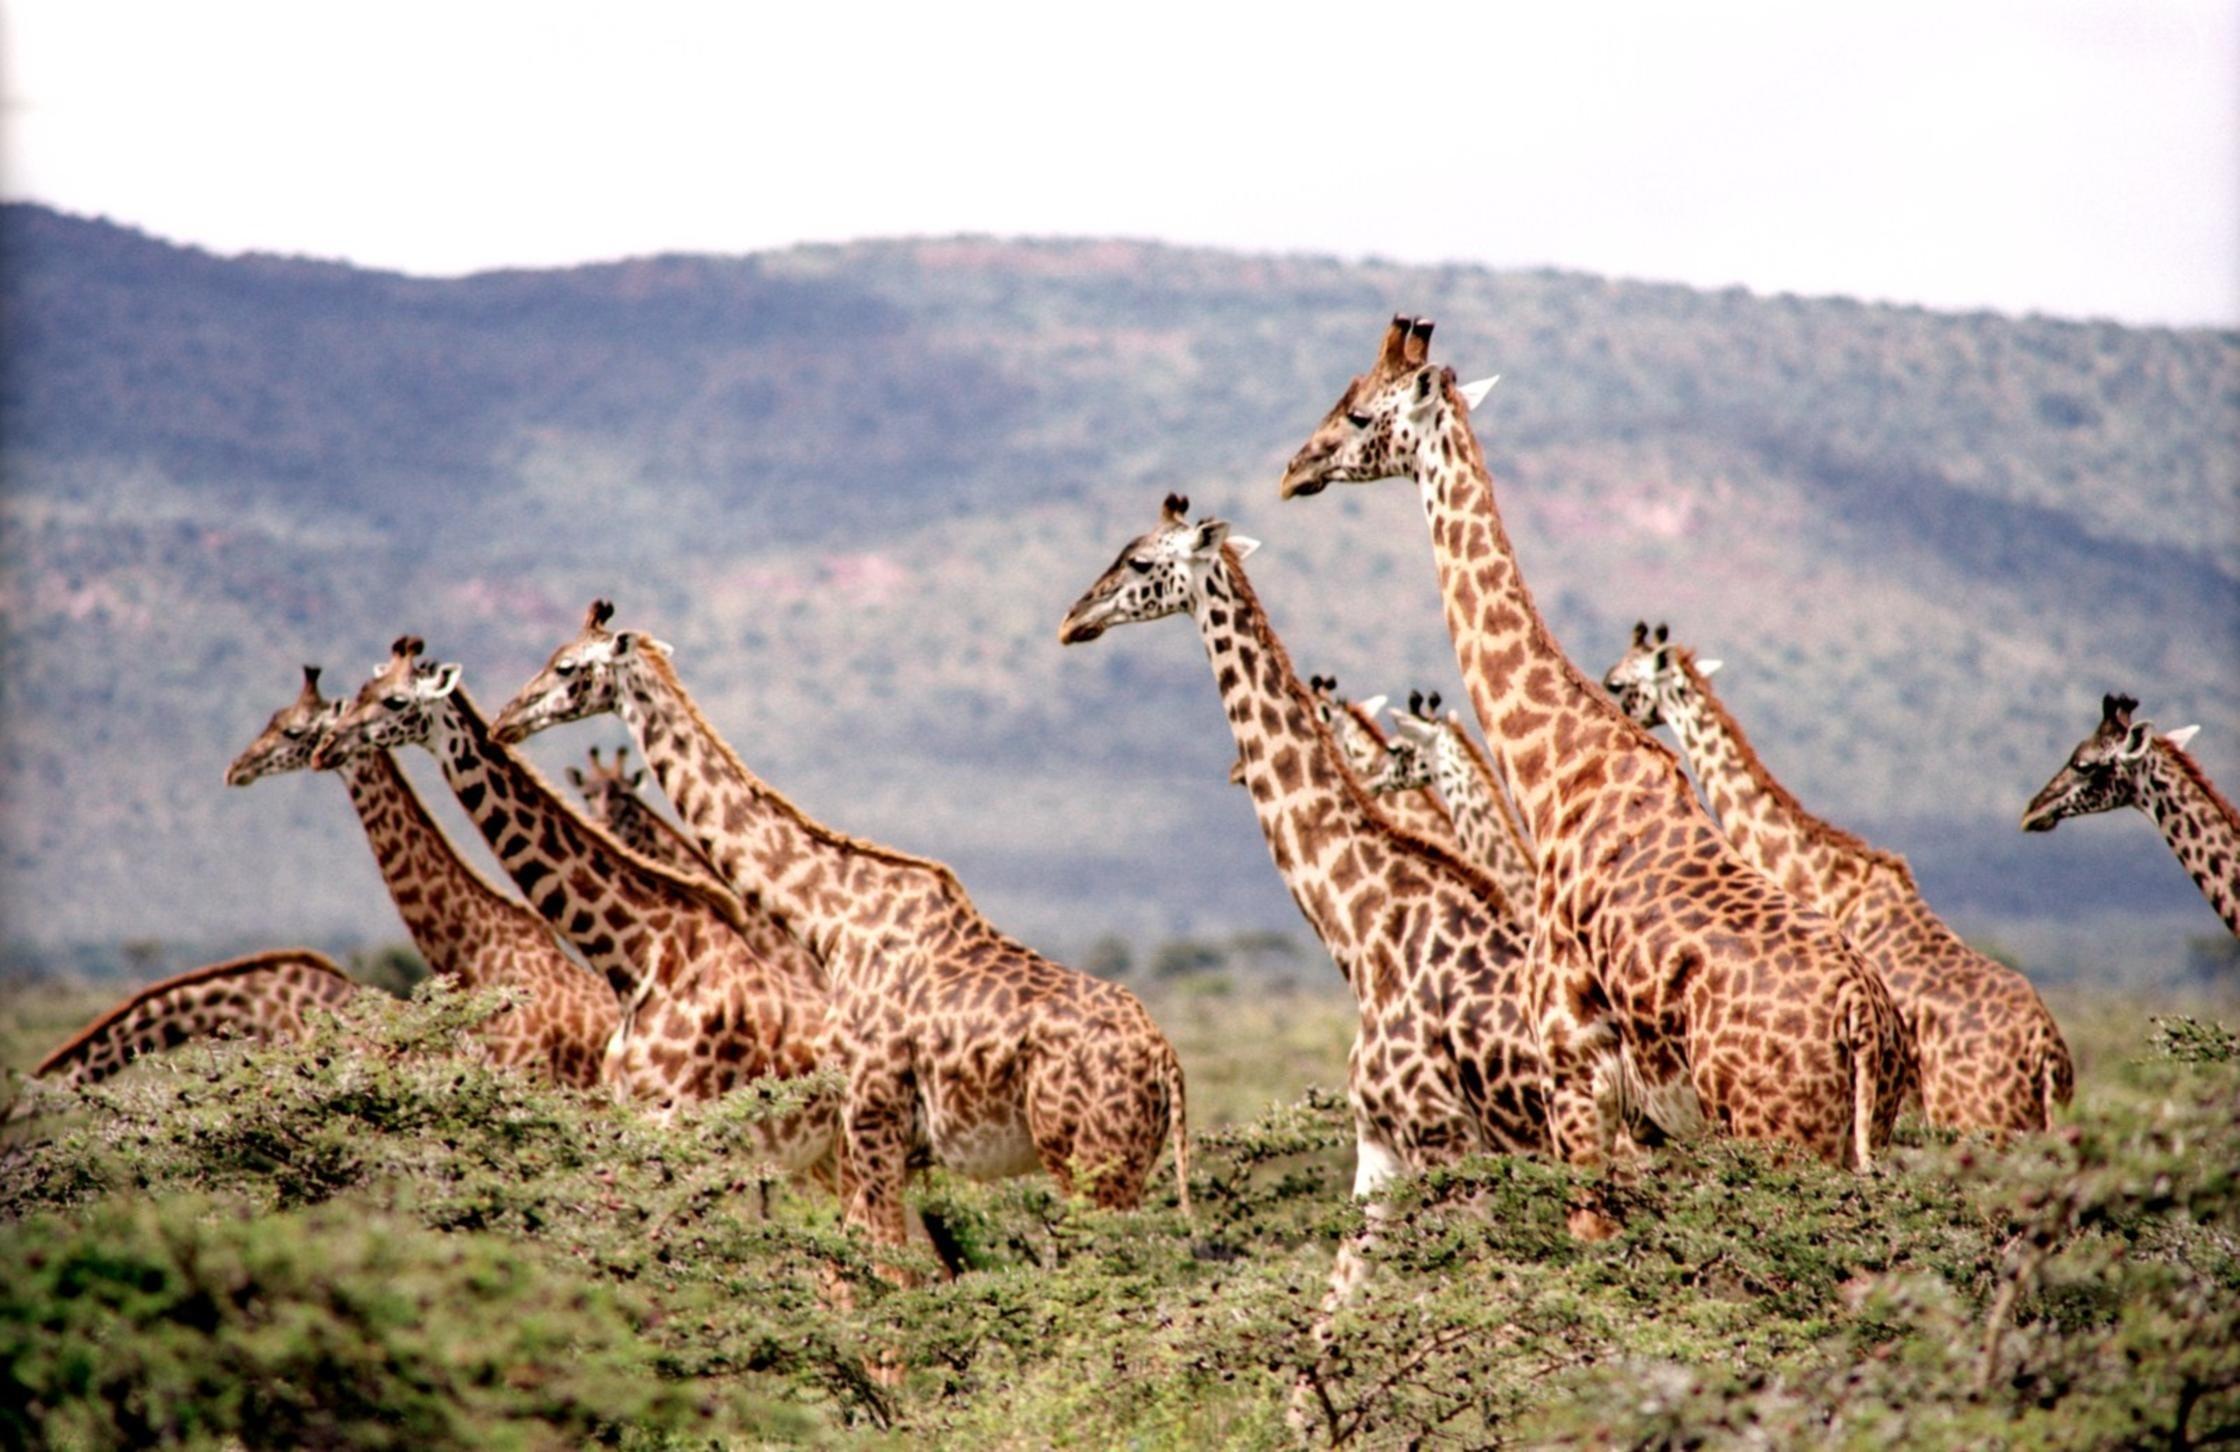 animals-giraffes-wildlife-38534.jpg